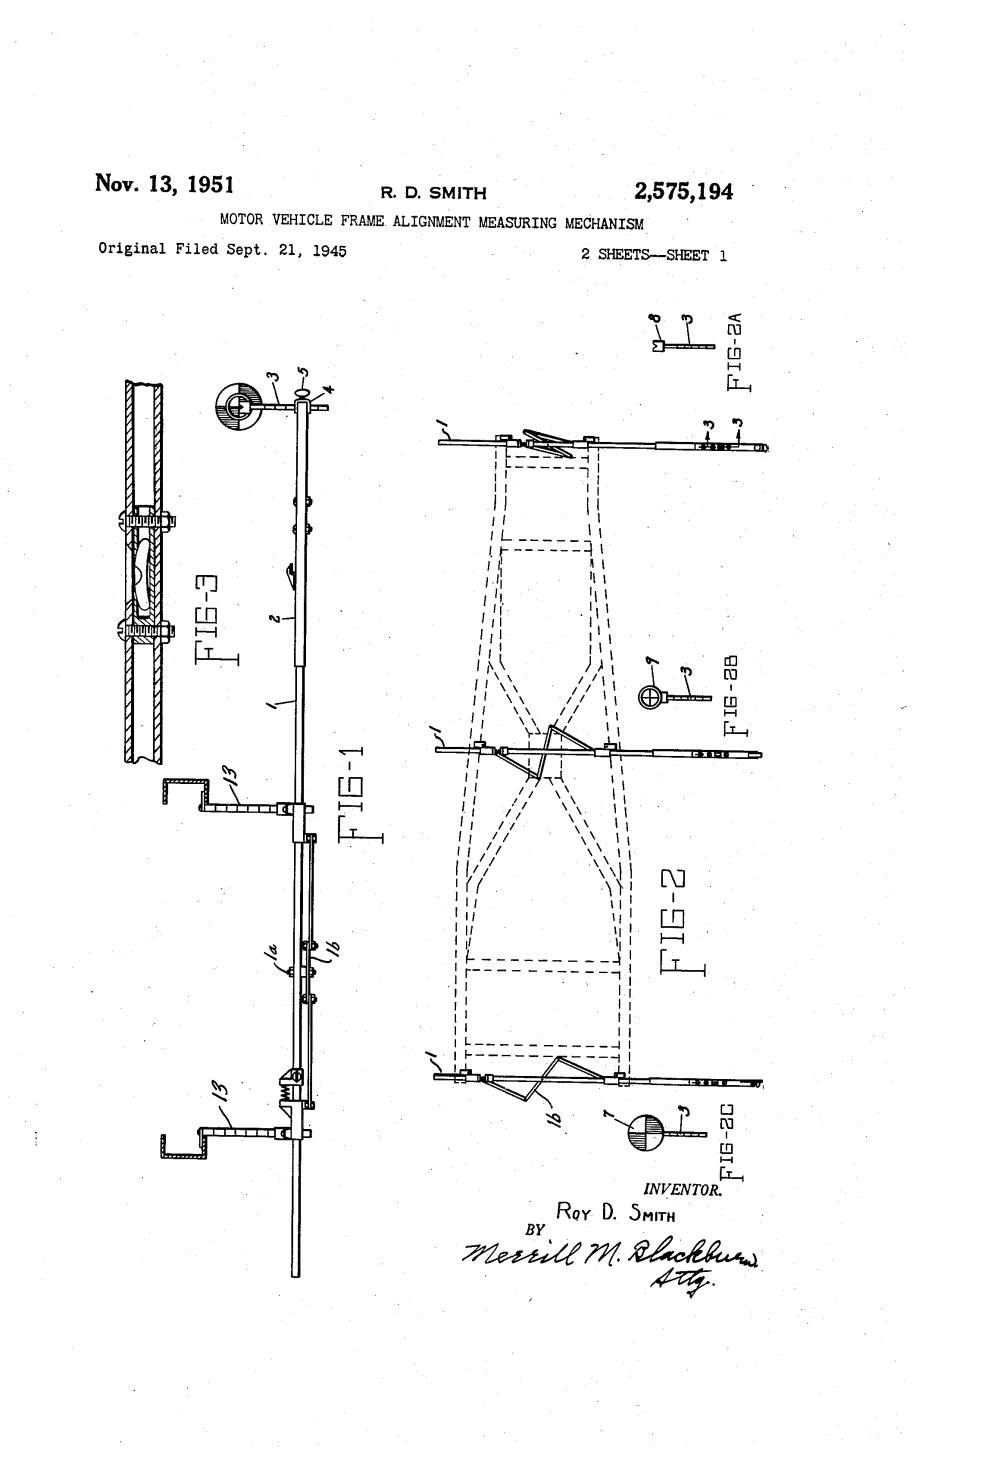 medium resolution of patent us2575194 motor vehicle frame alignment measuring mechanism google patents